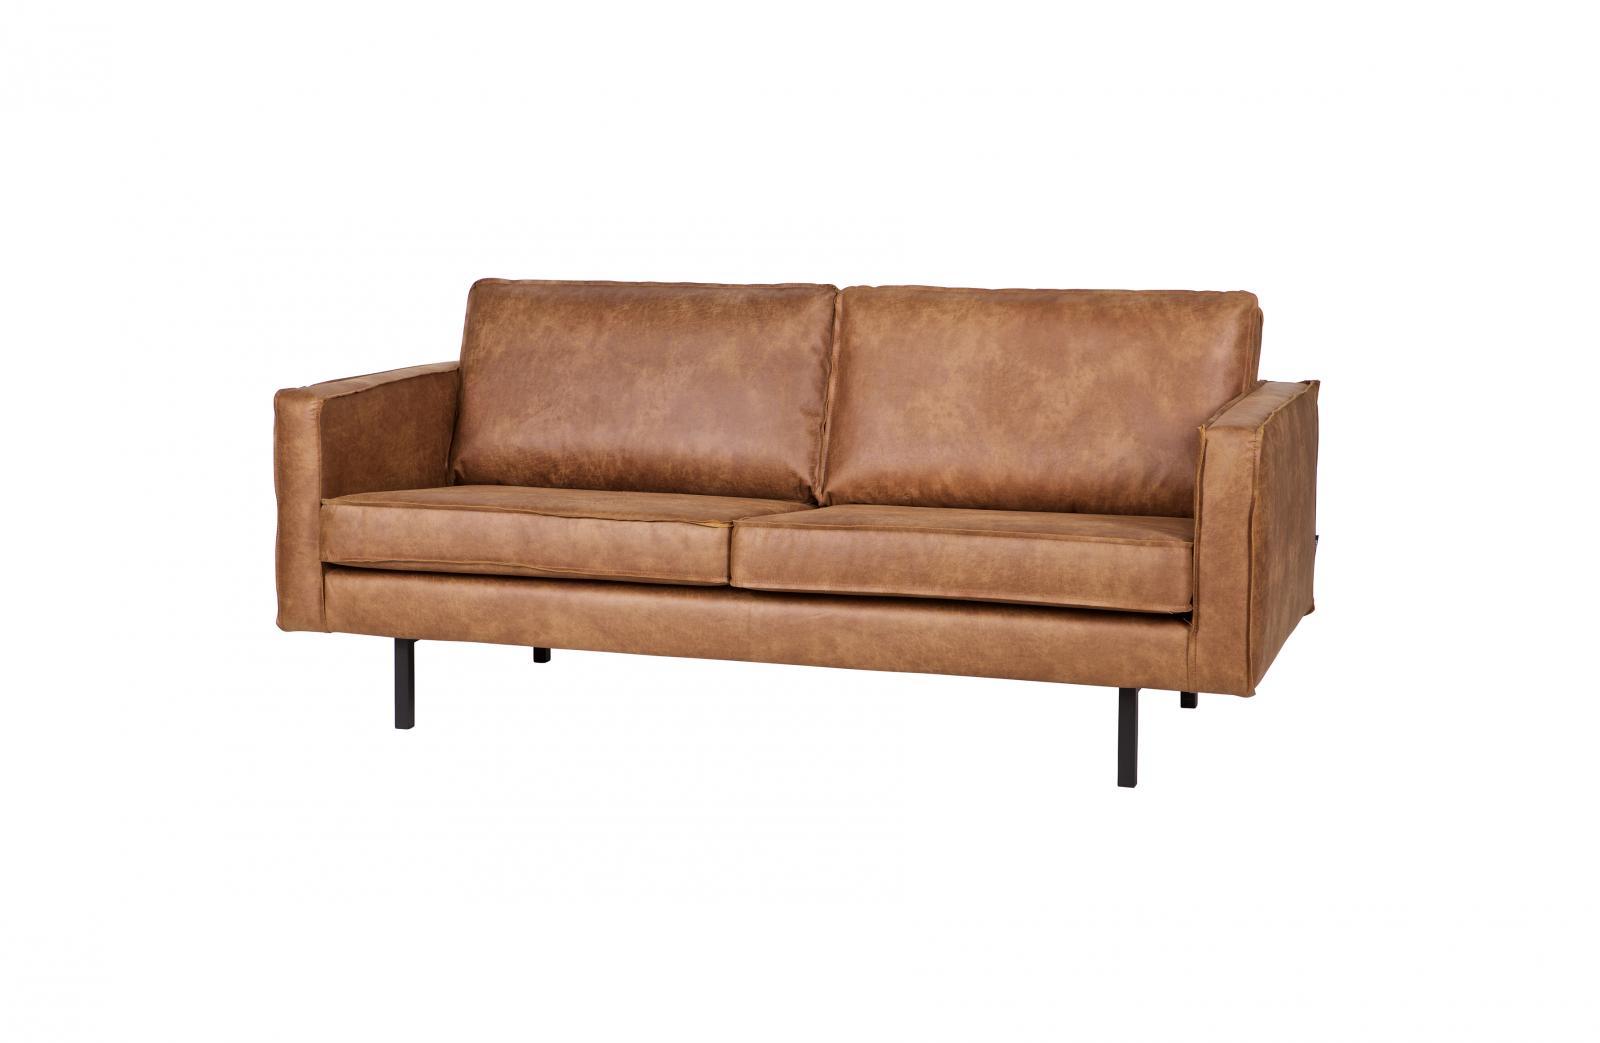 bepurehome rodeo ledersofa 2 5 sitzer cognac ledercouch braun. Black Bedroom Furniture Sets. Home Design Ideas